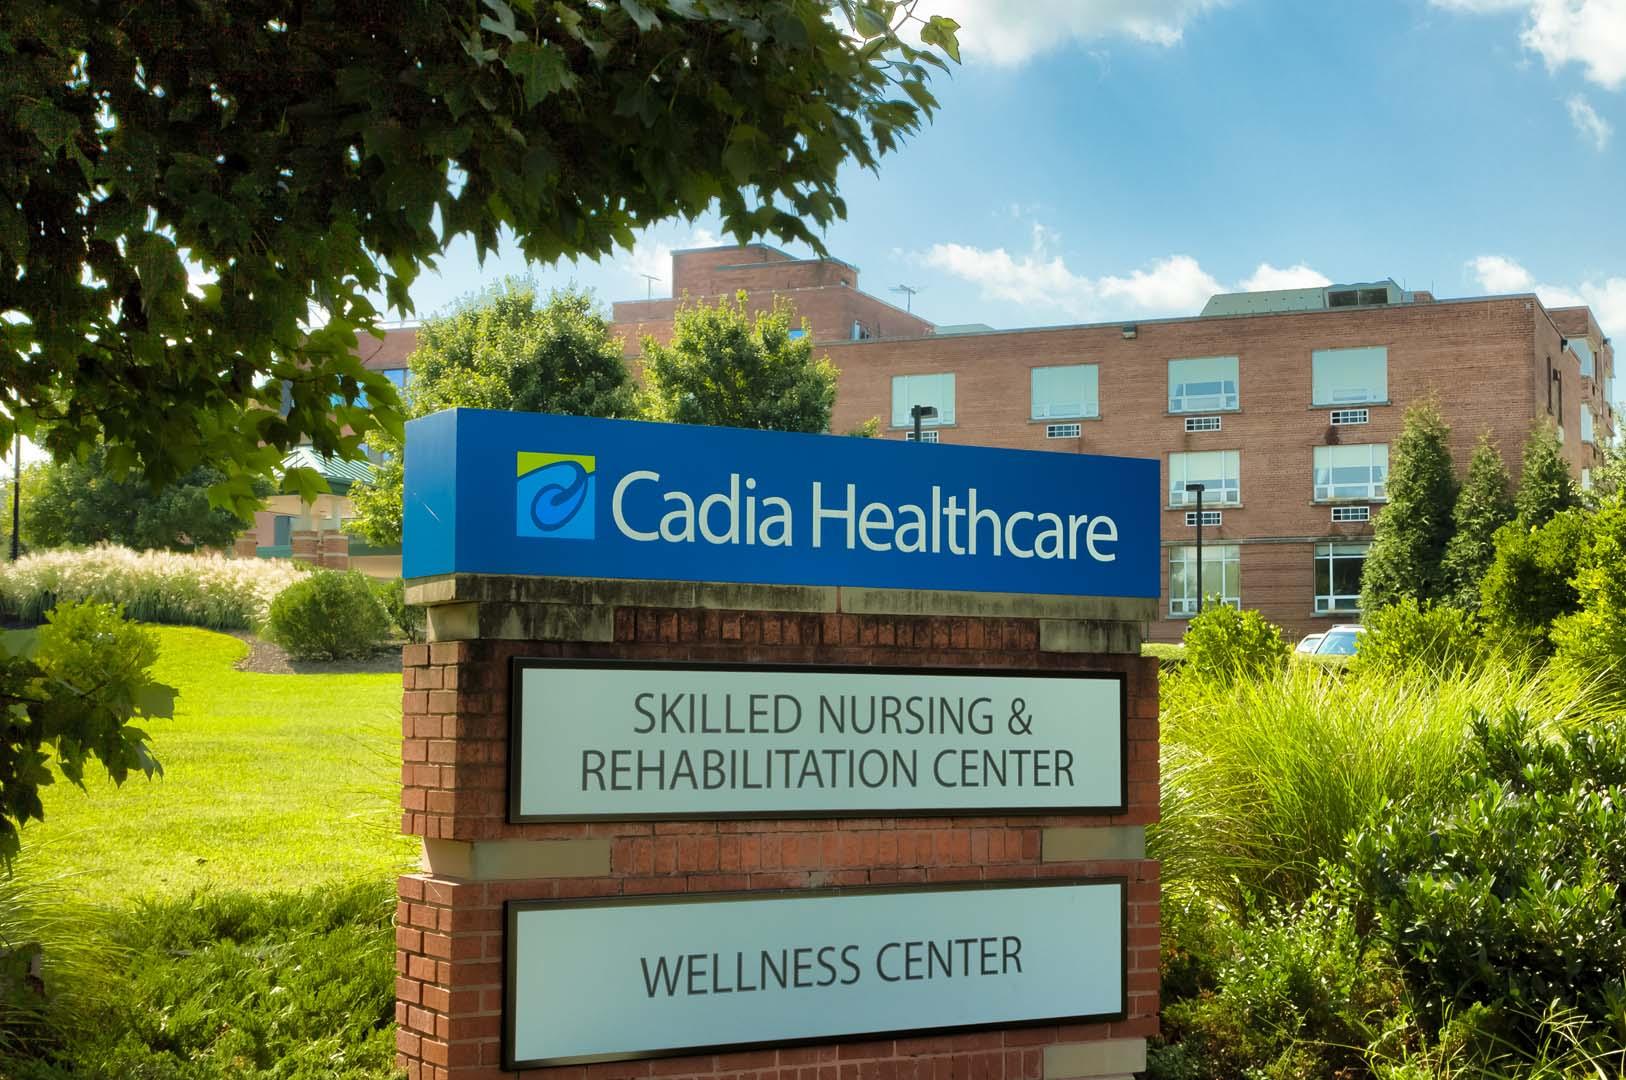 Hyattsville Cadia Healthcare